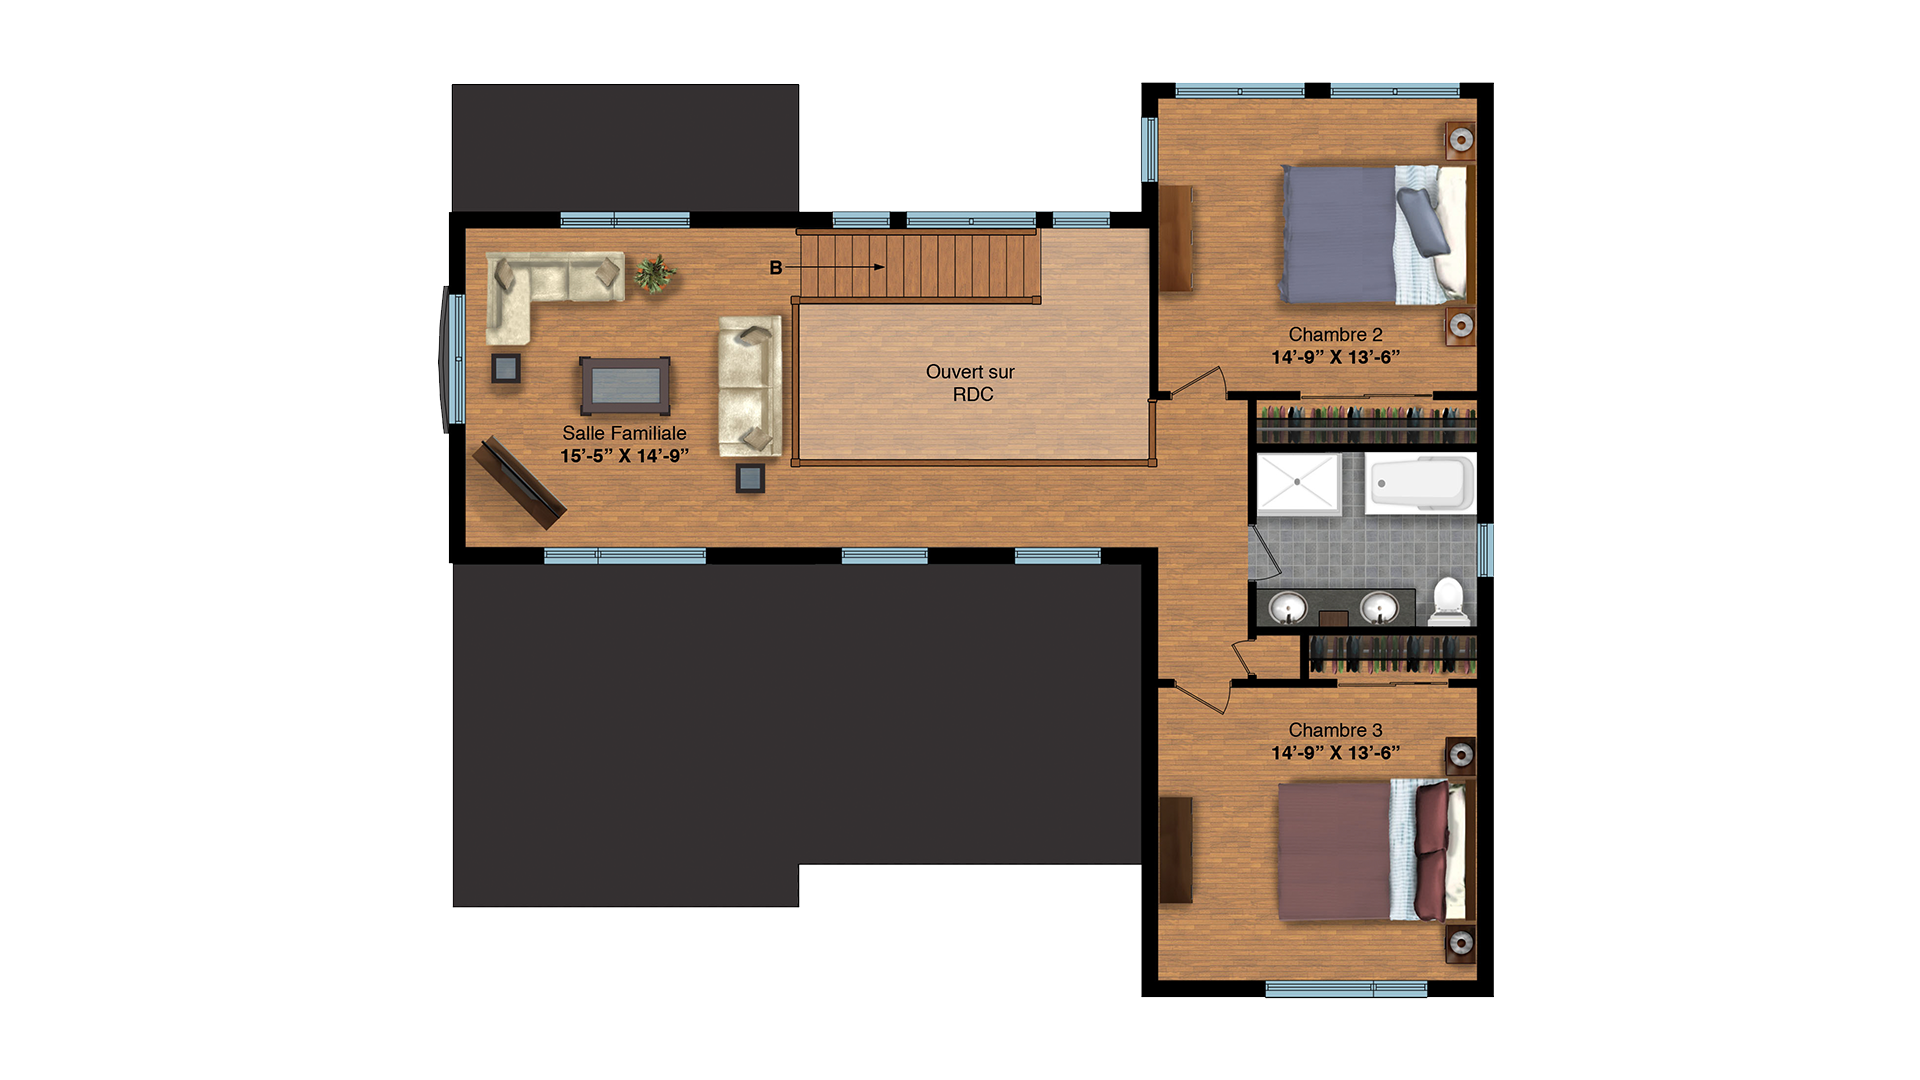 bogota-plan-plancher-etage